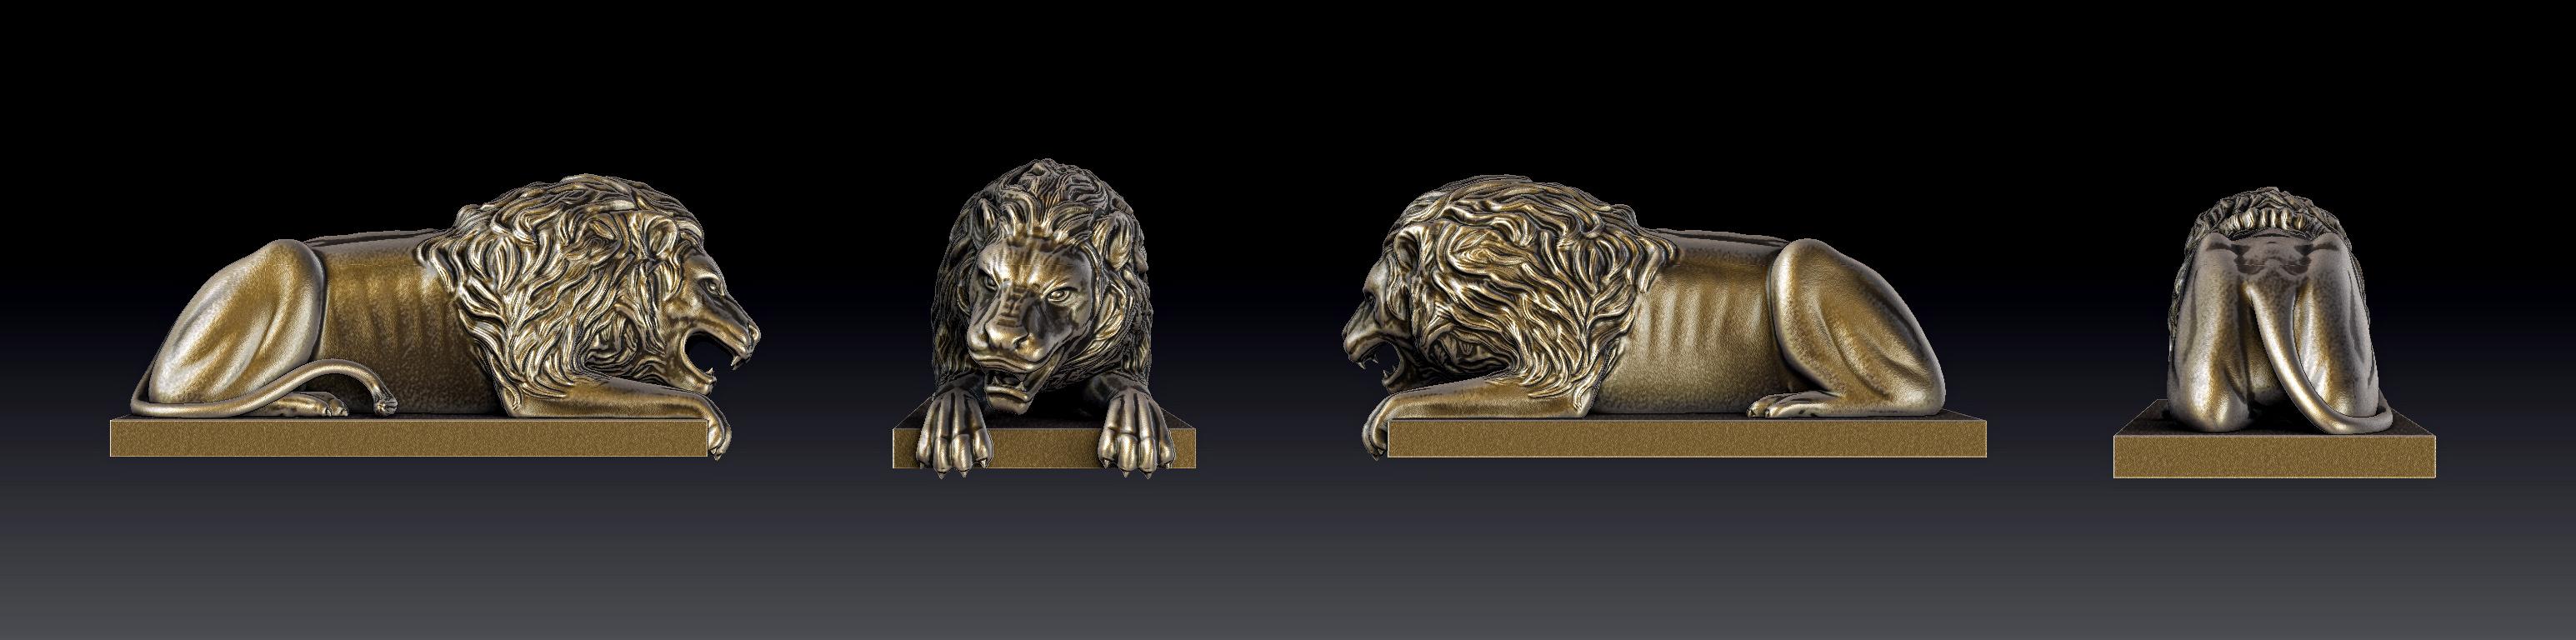 Статуя - Лев